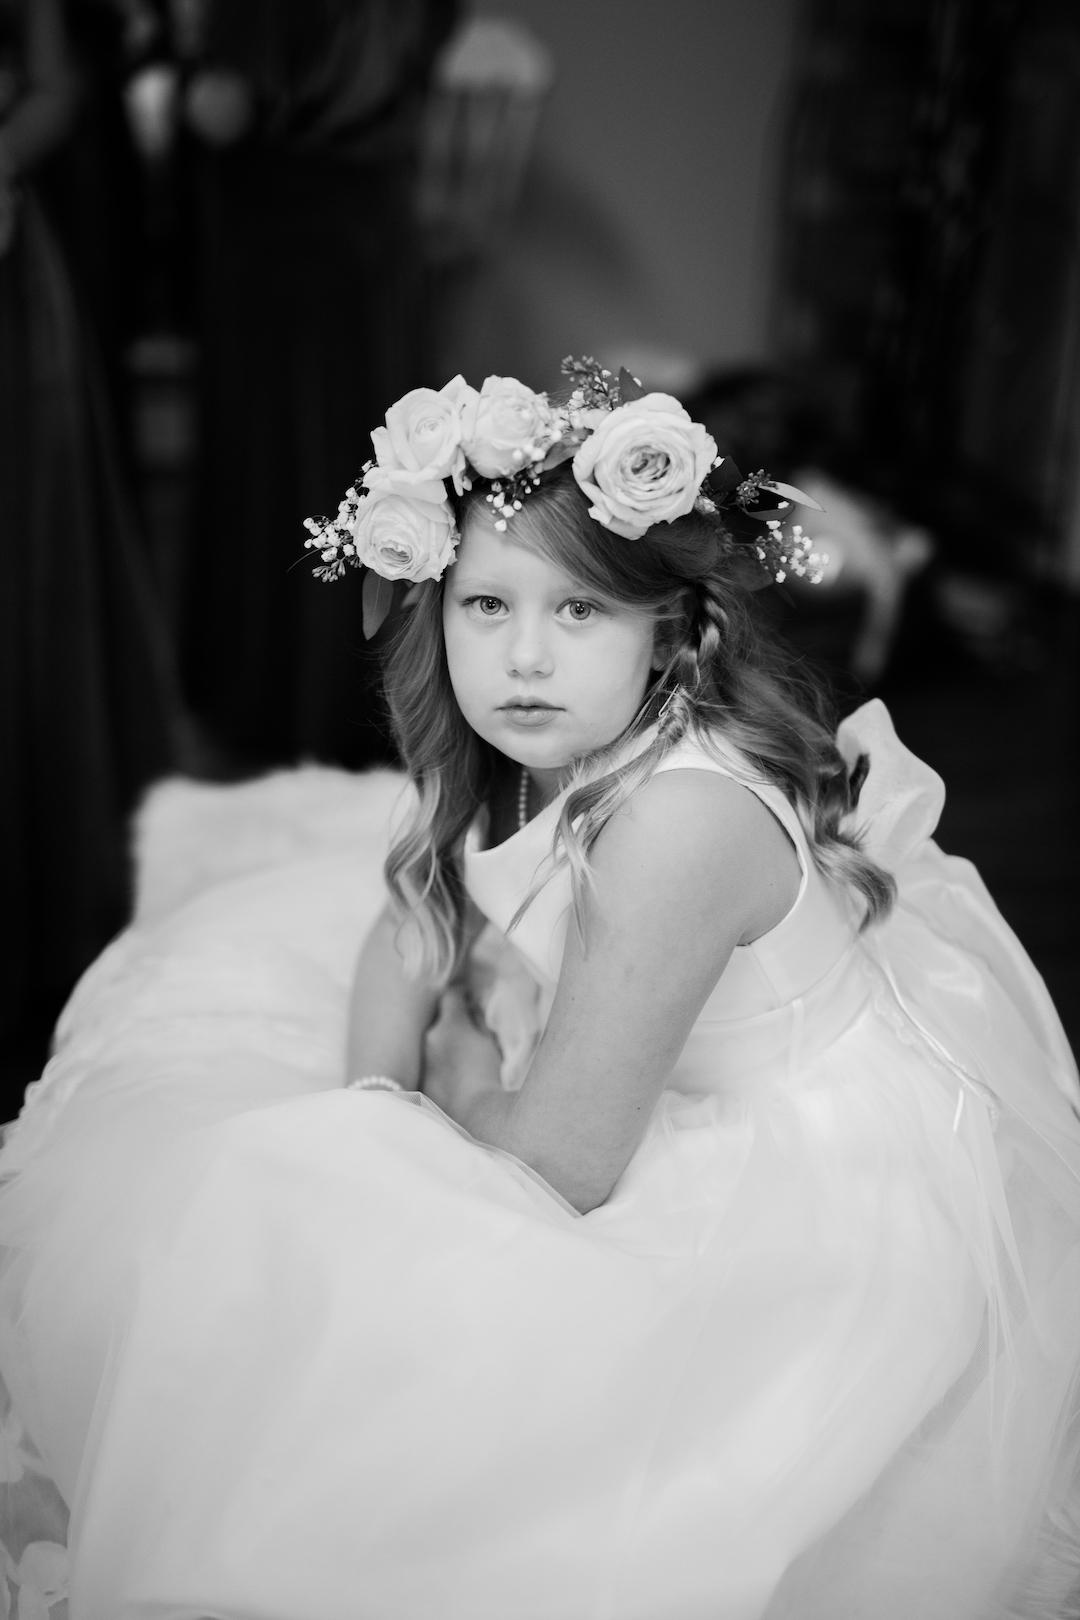 Nashville Wedding Photographer Harp & Olive Photography featured on Nashville Bride Guide